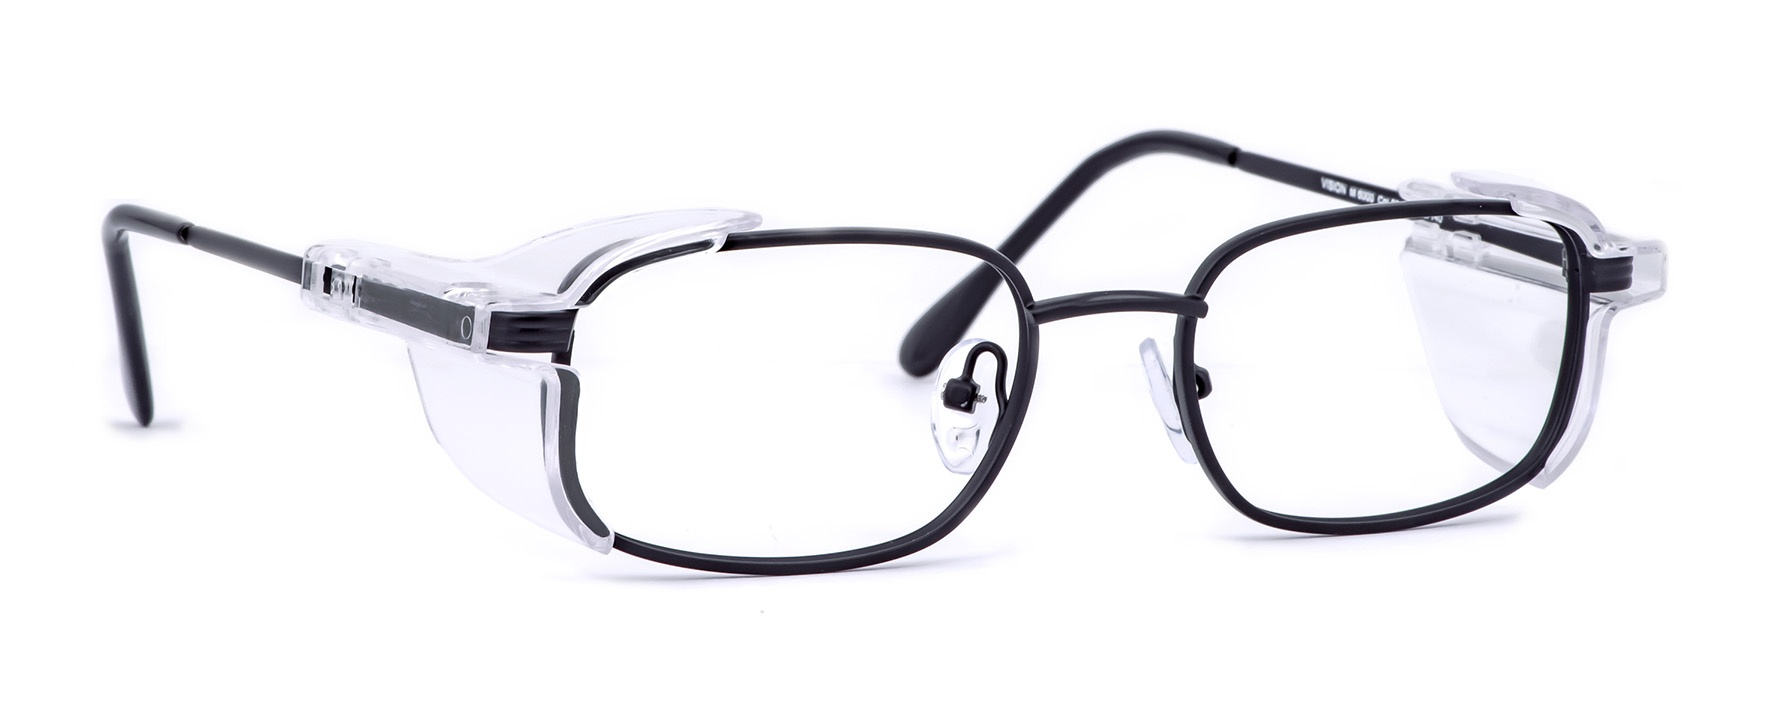 VISION M6000 6000-03-4800 (BLACK)